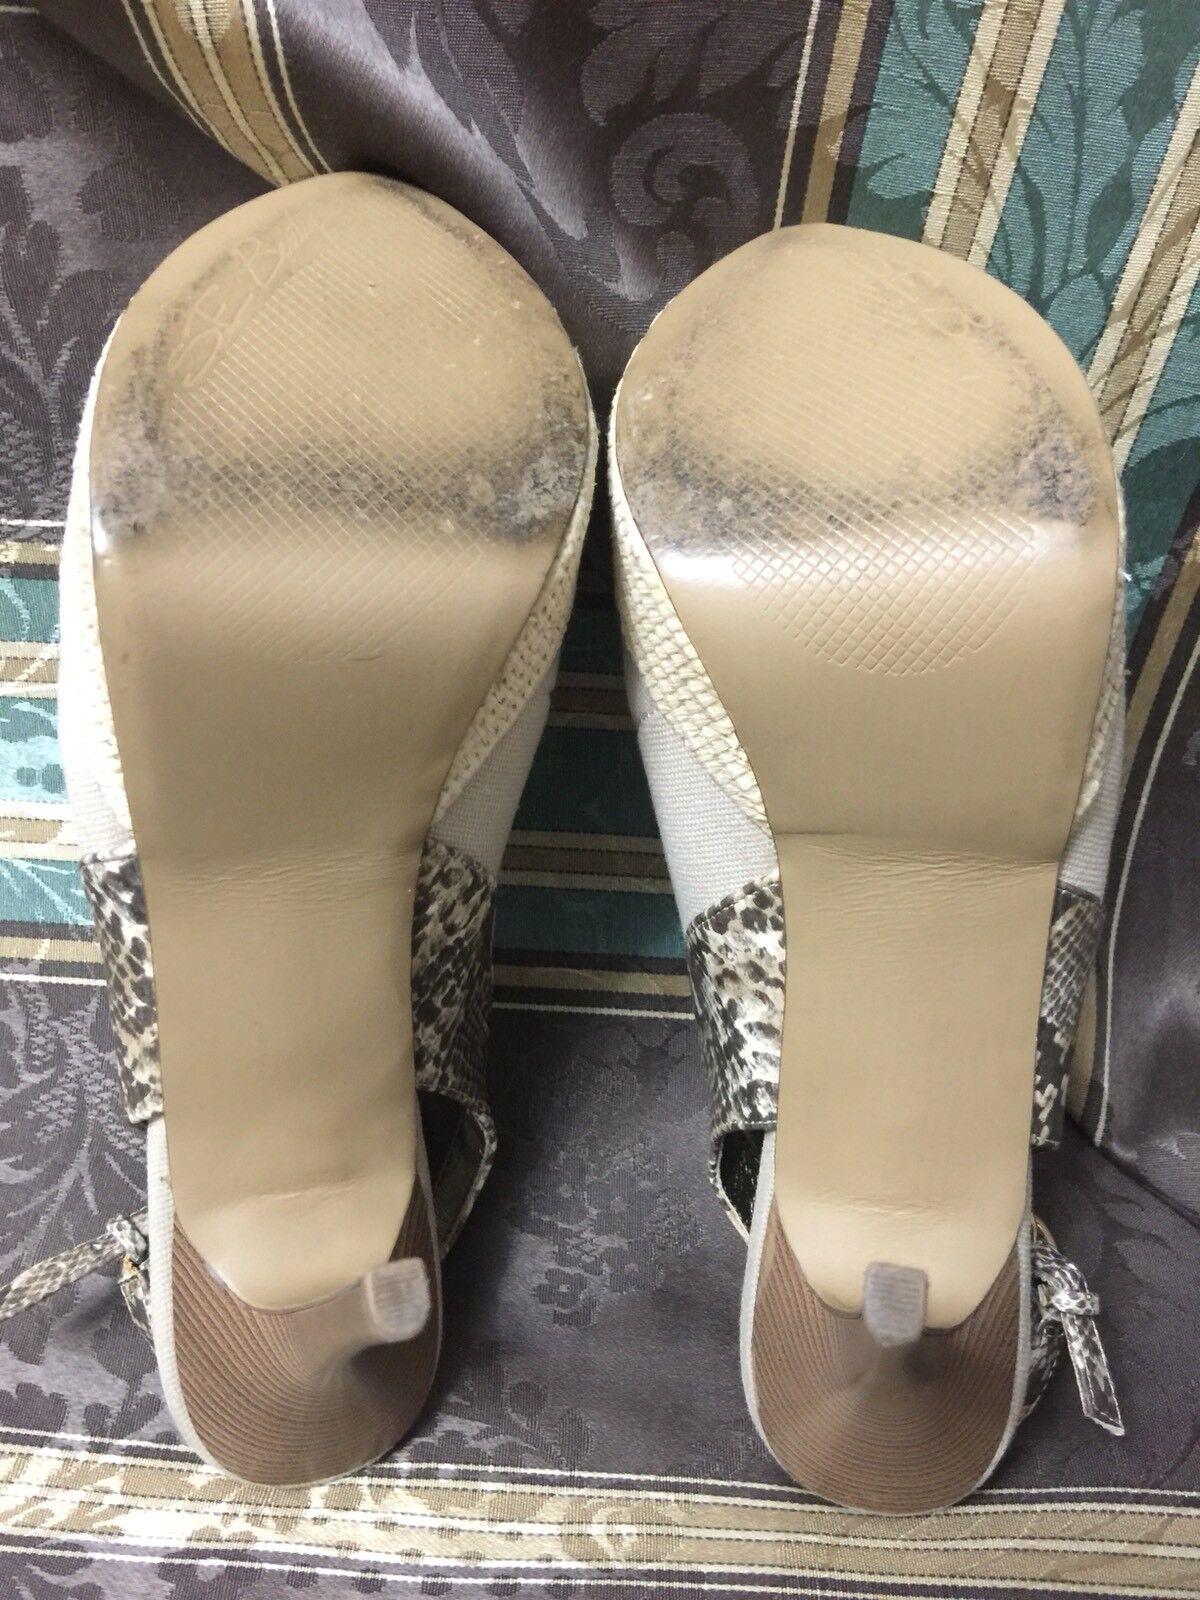 SE Sam Edelman Boutique Boutique Boutique damen  Nansi  peep toe slingback platform heels sz 9 M c967bf